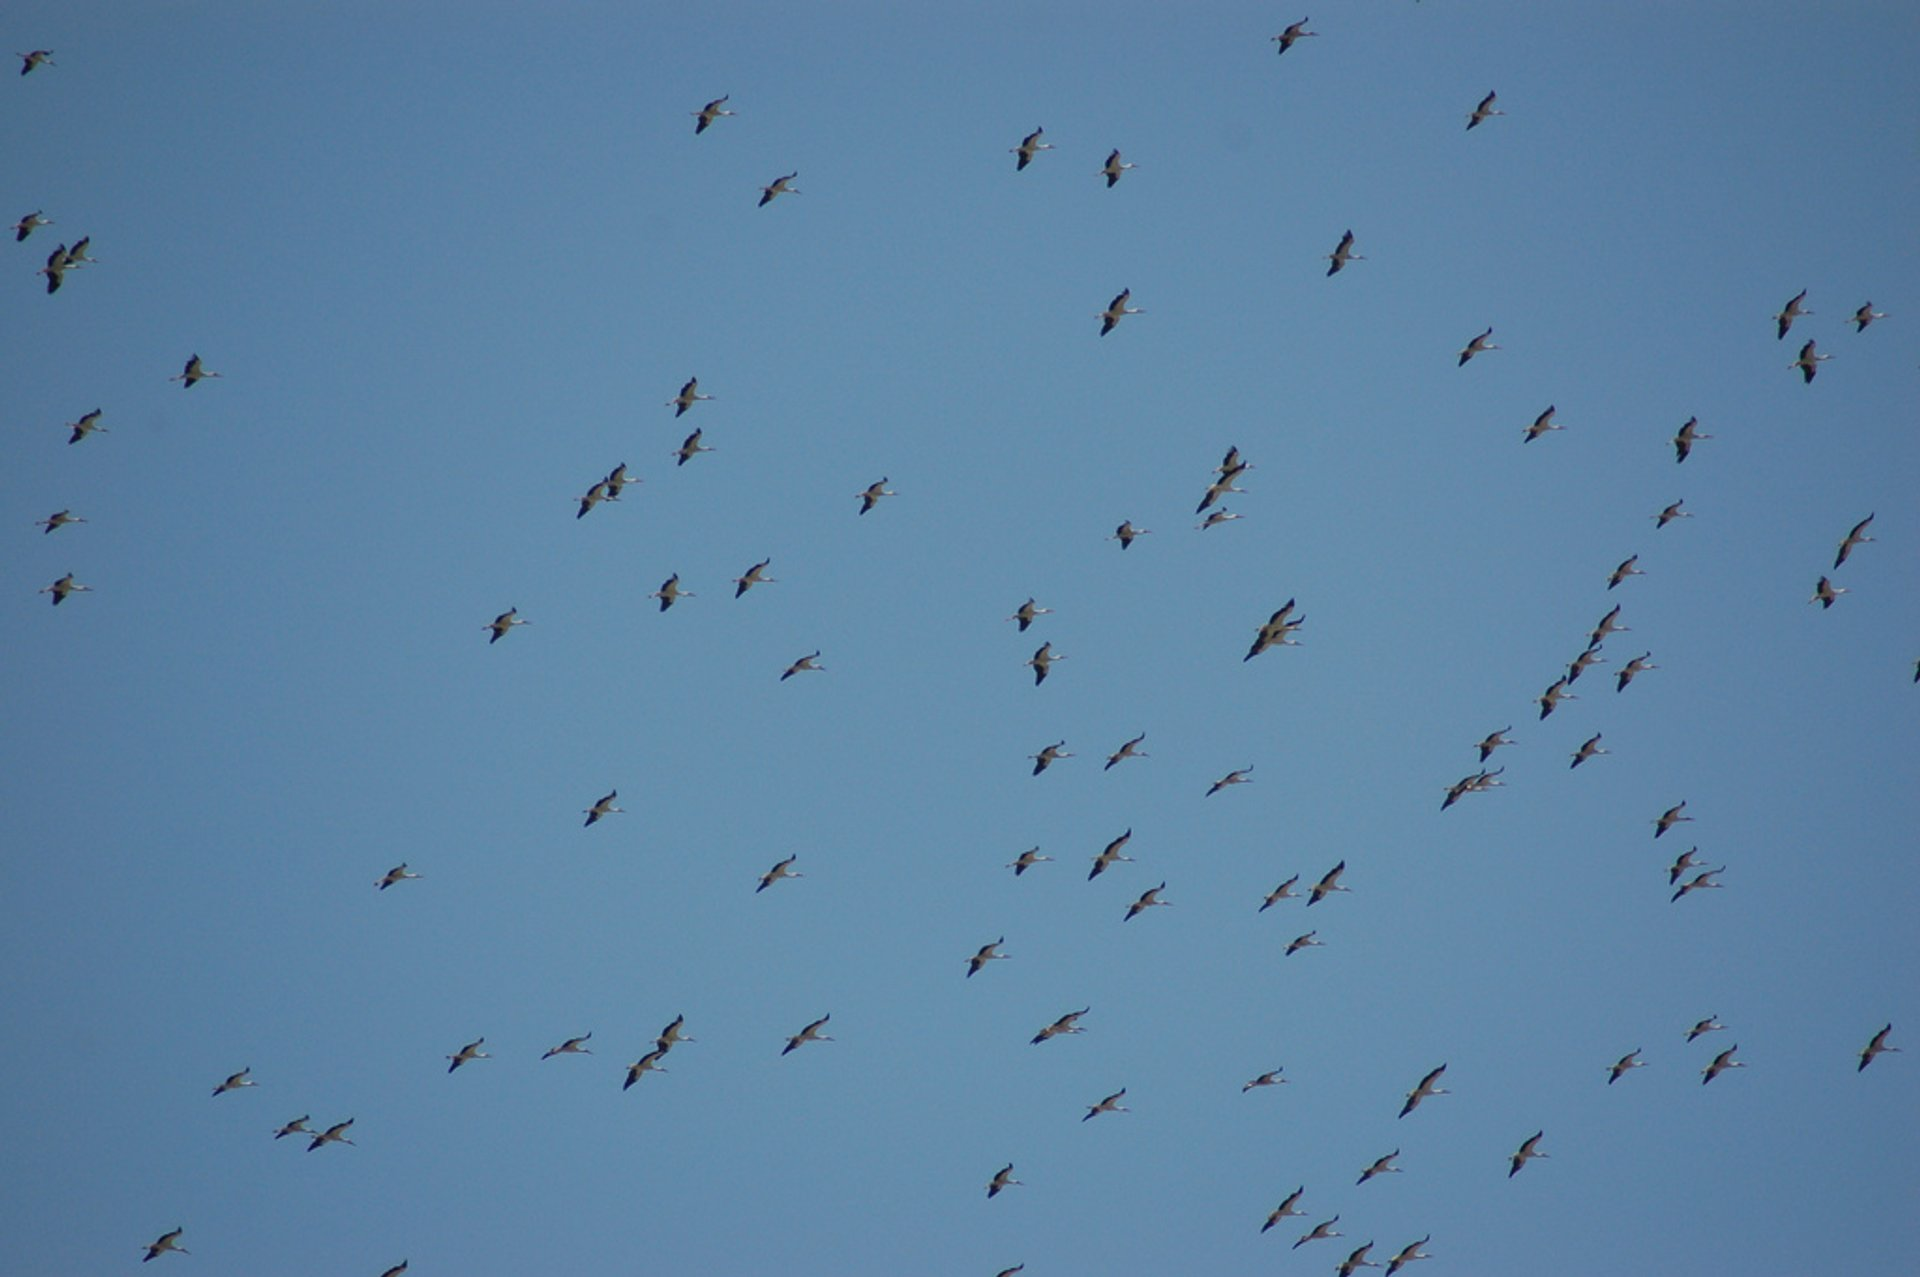 White Stork Migration in Israel 2020 - Best Time